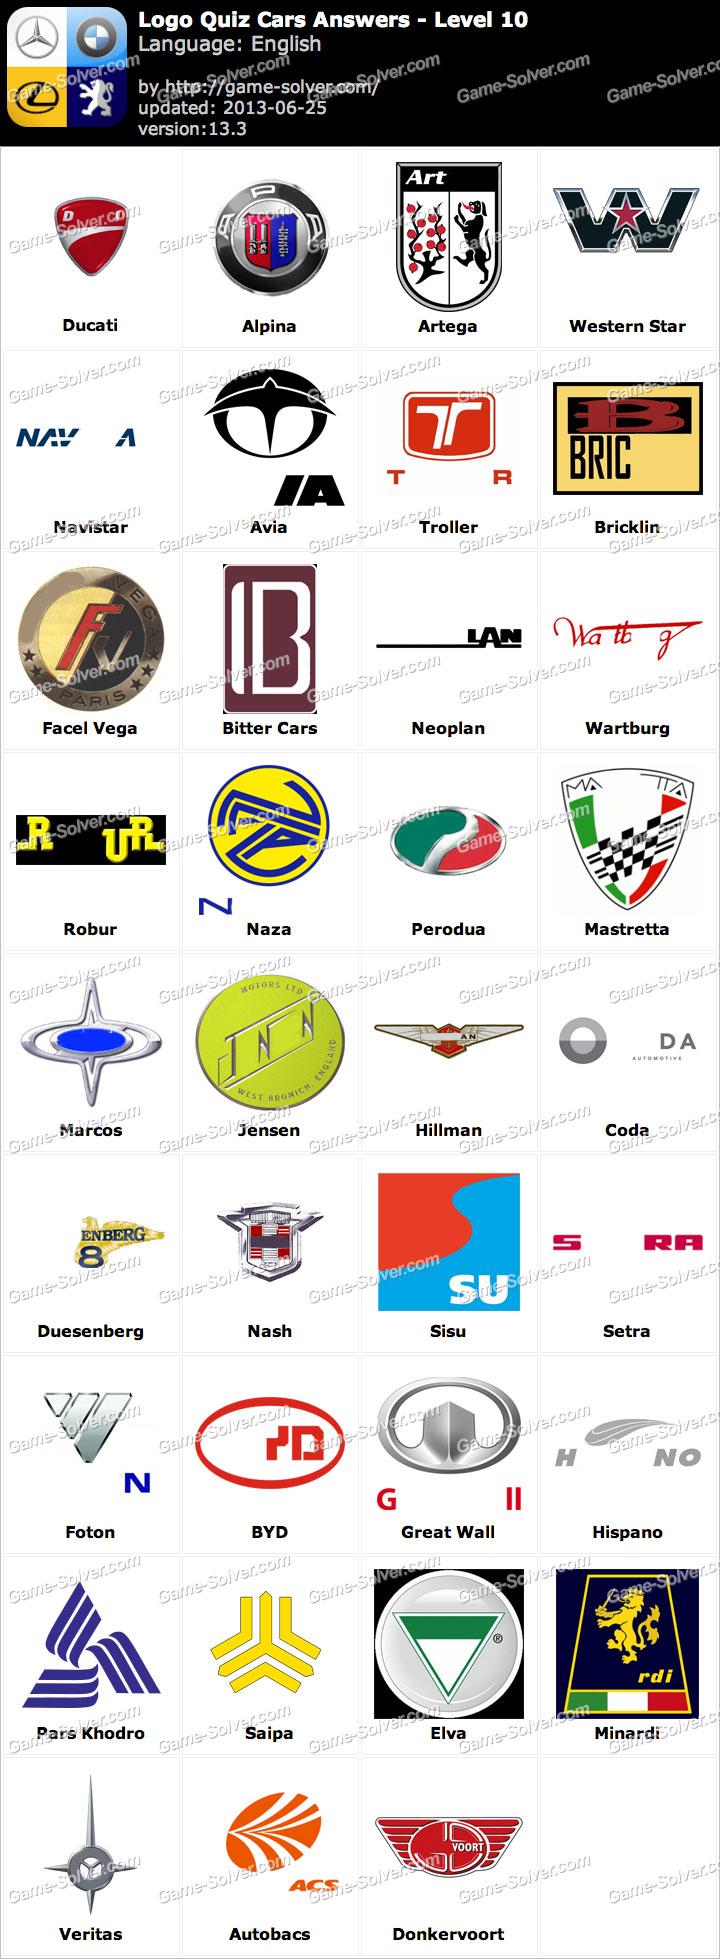 Logo Quiz Cars Answers Level 10